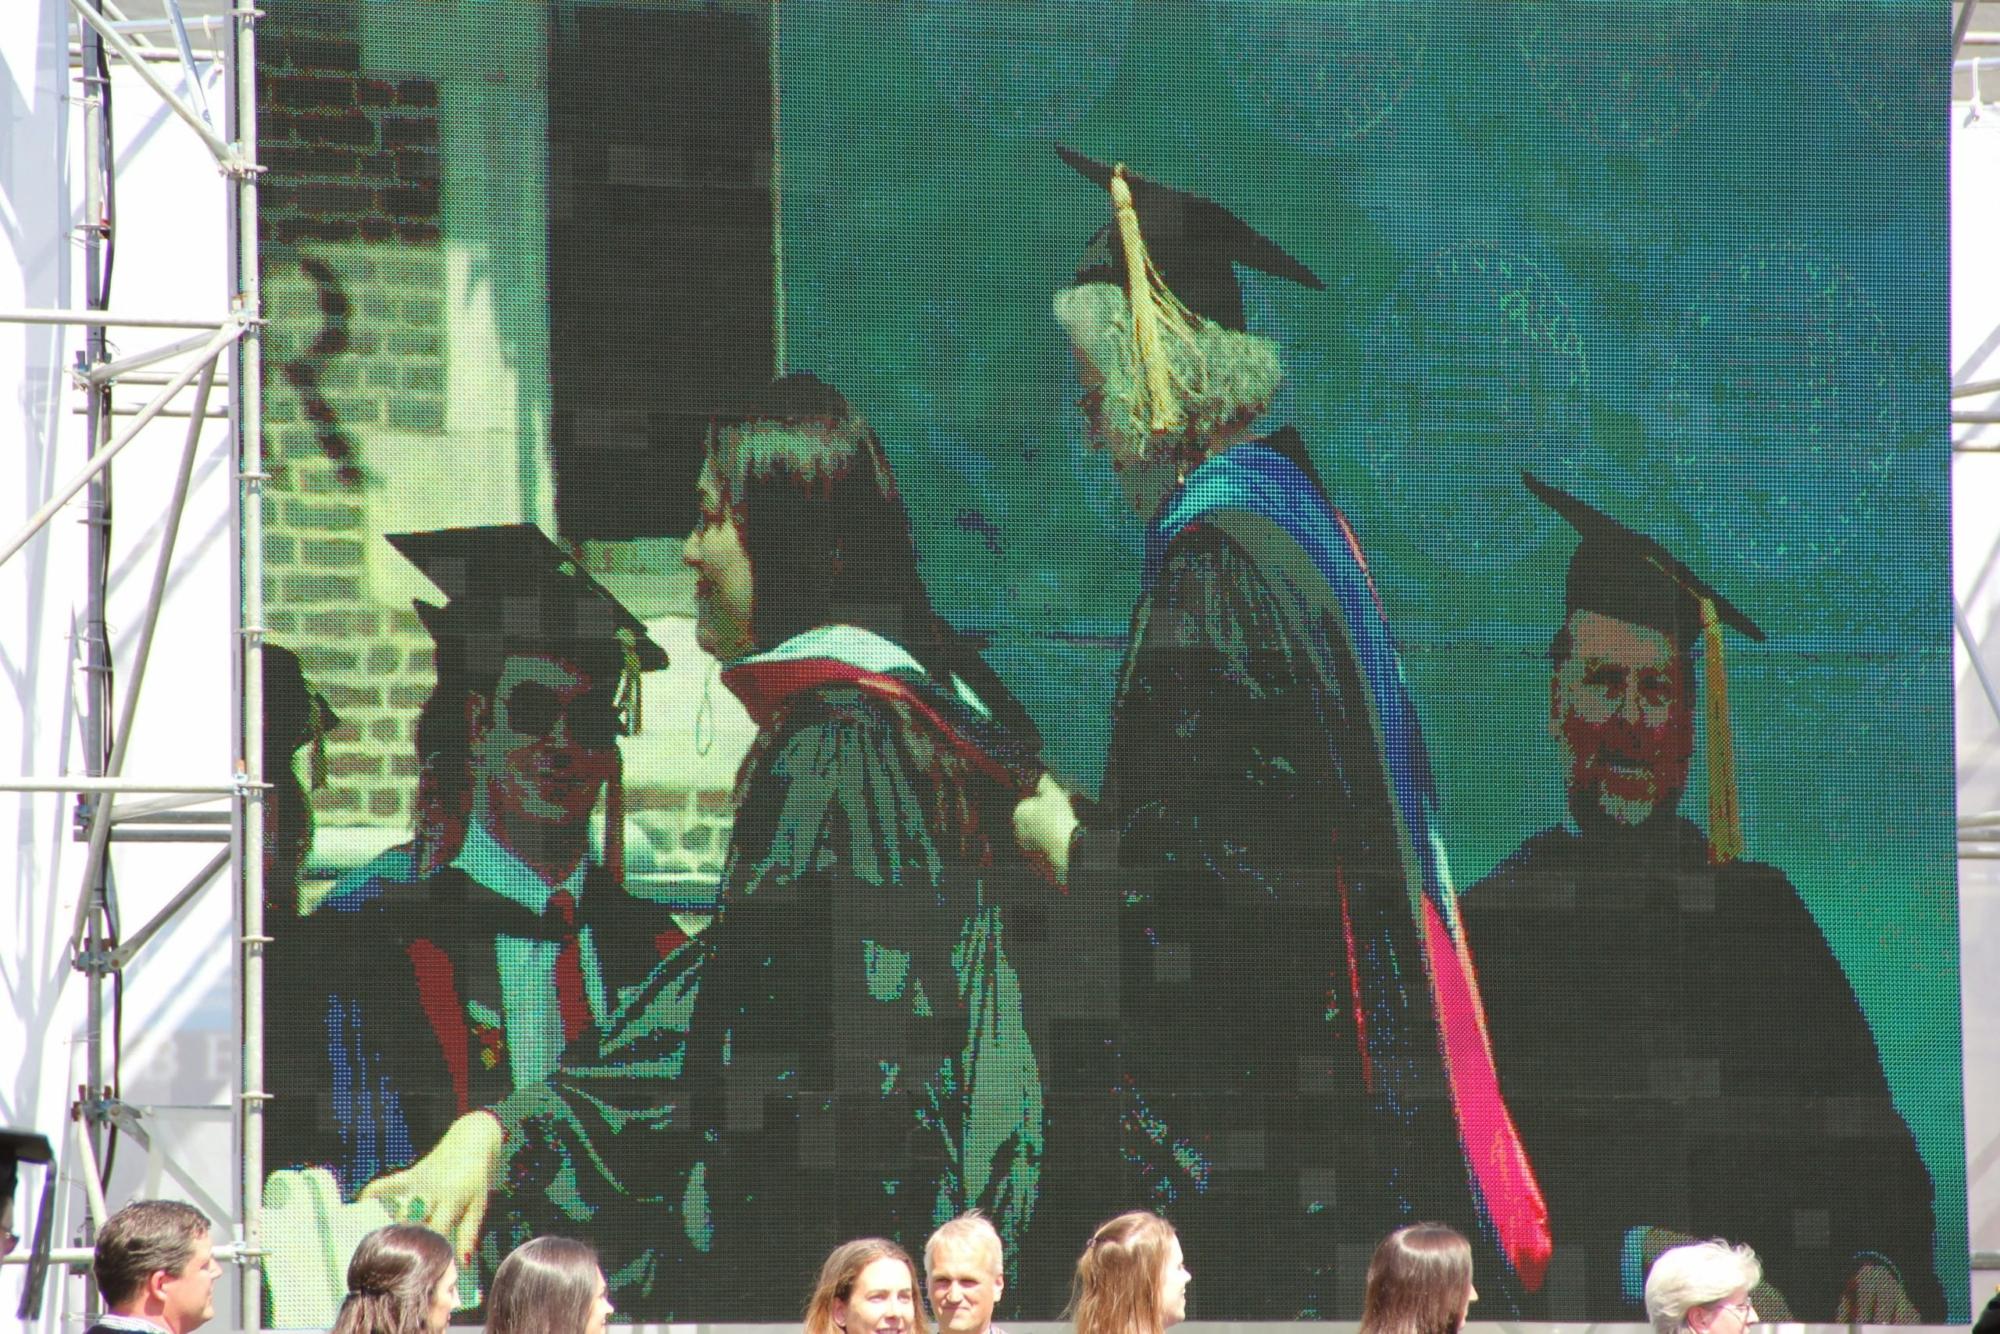 Raquel Esteves-Joyce being hooded on the jumbotron at her Ph.D. graduation